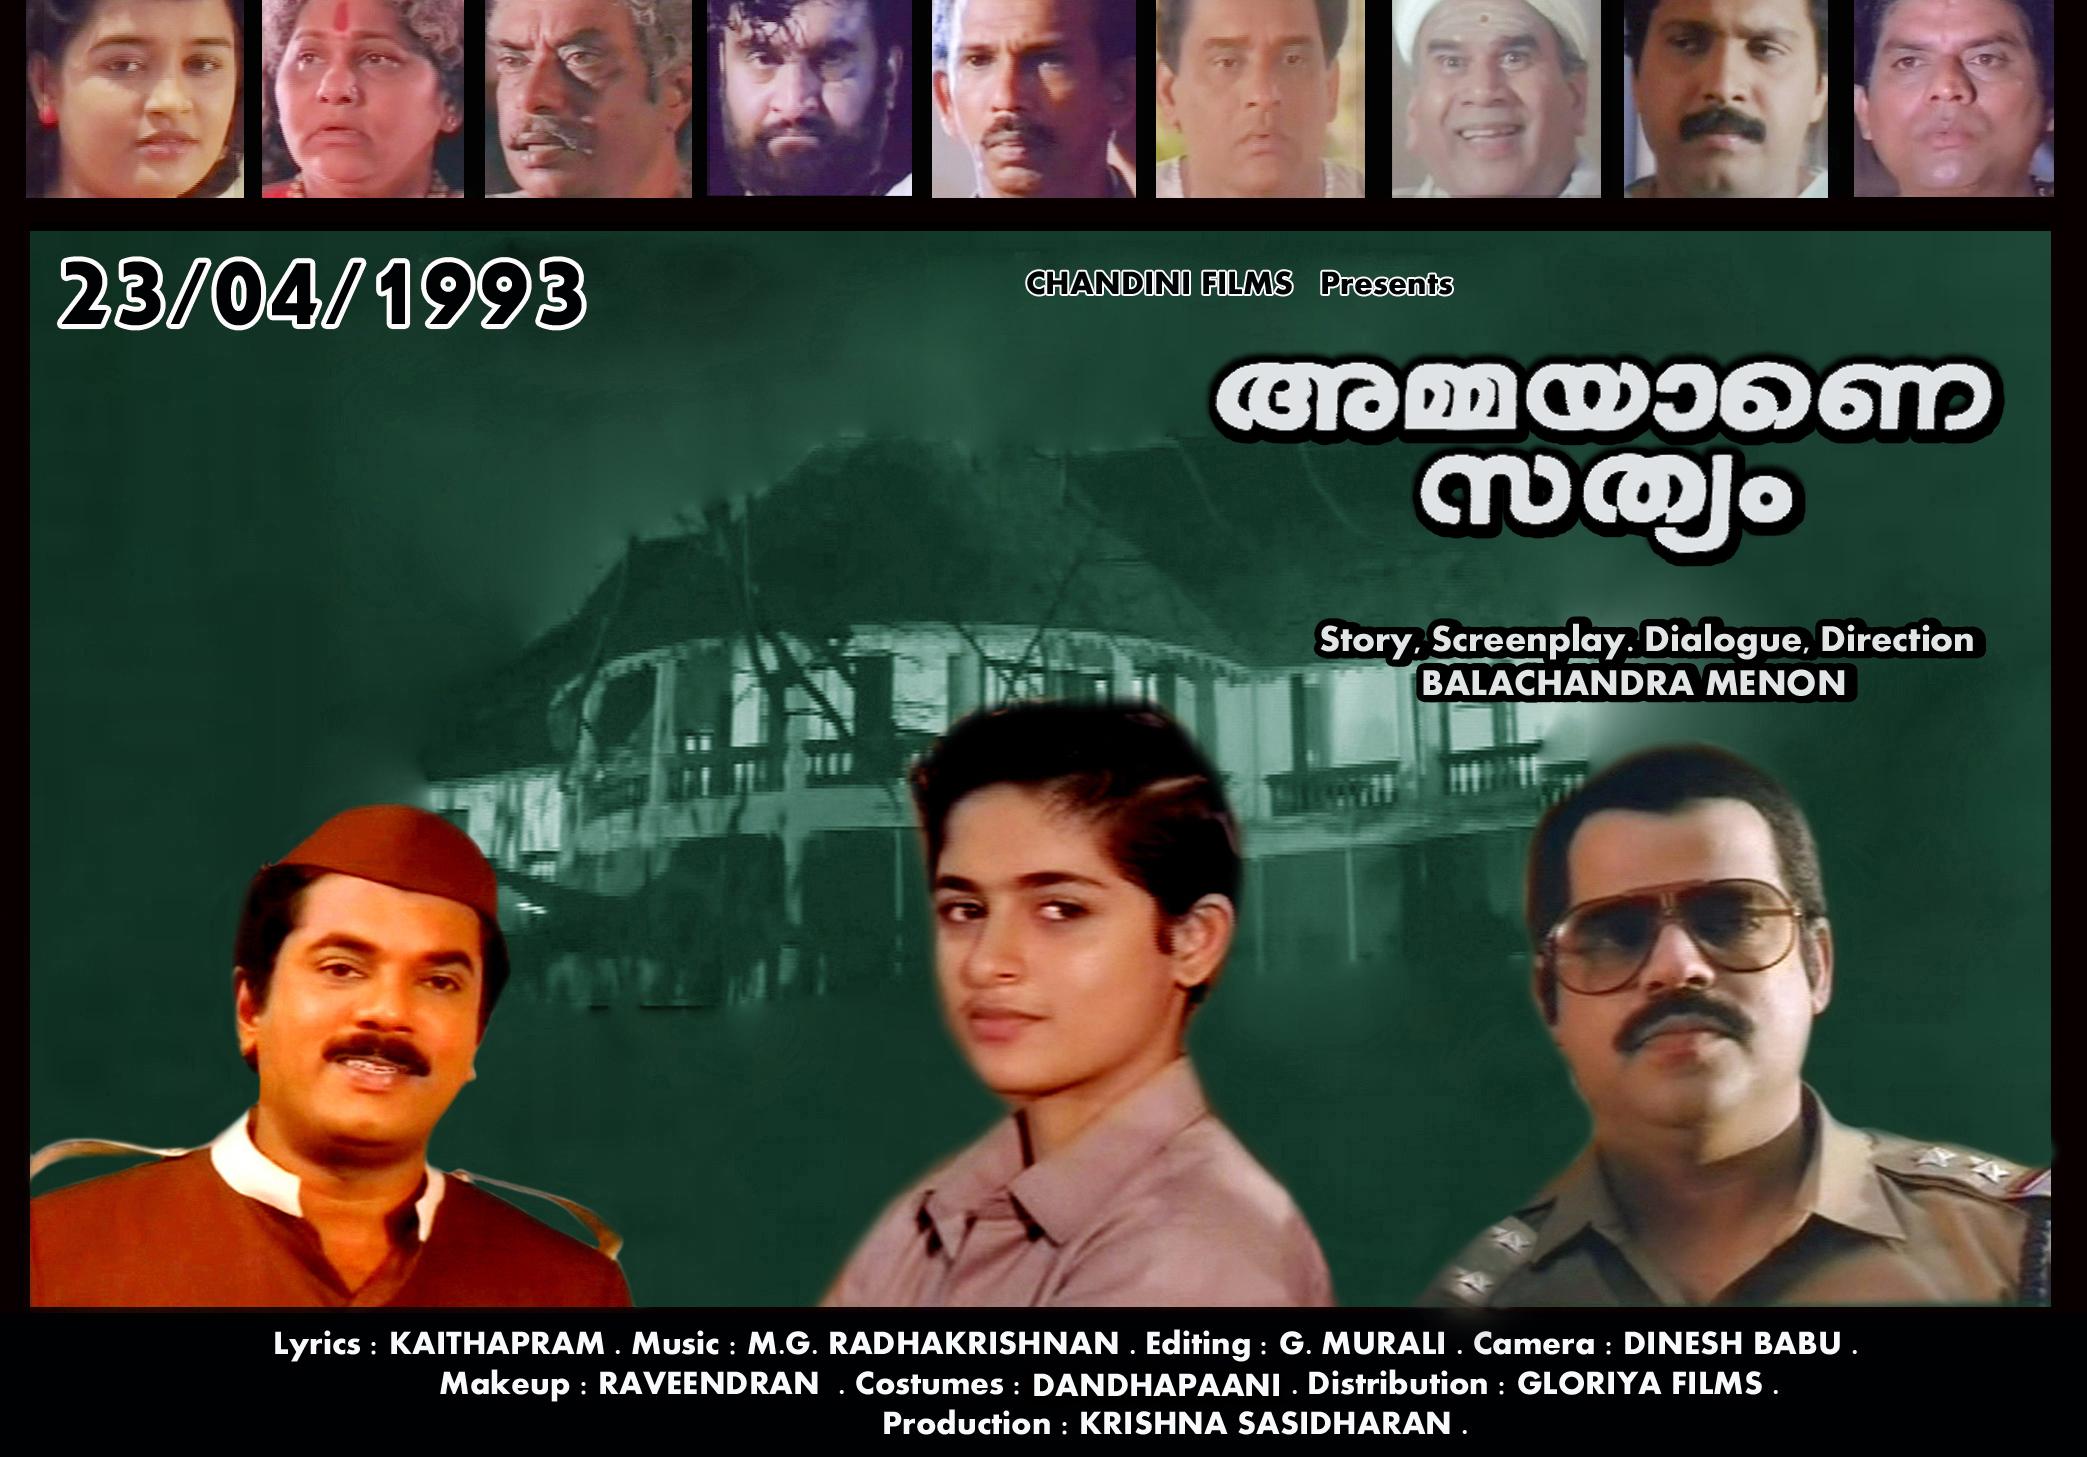 30) Ammayane Sathyam (1993)